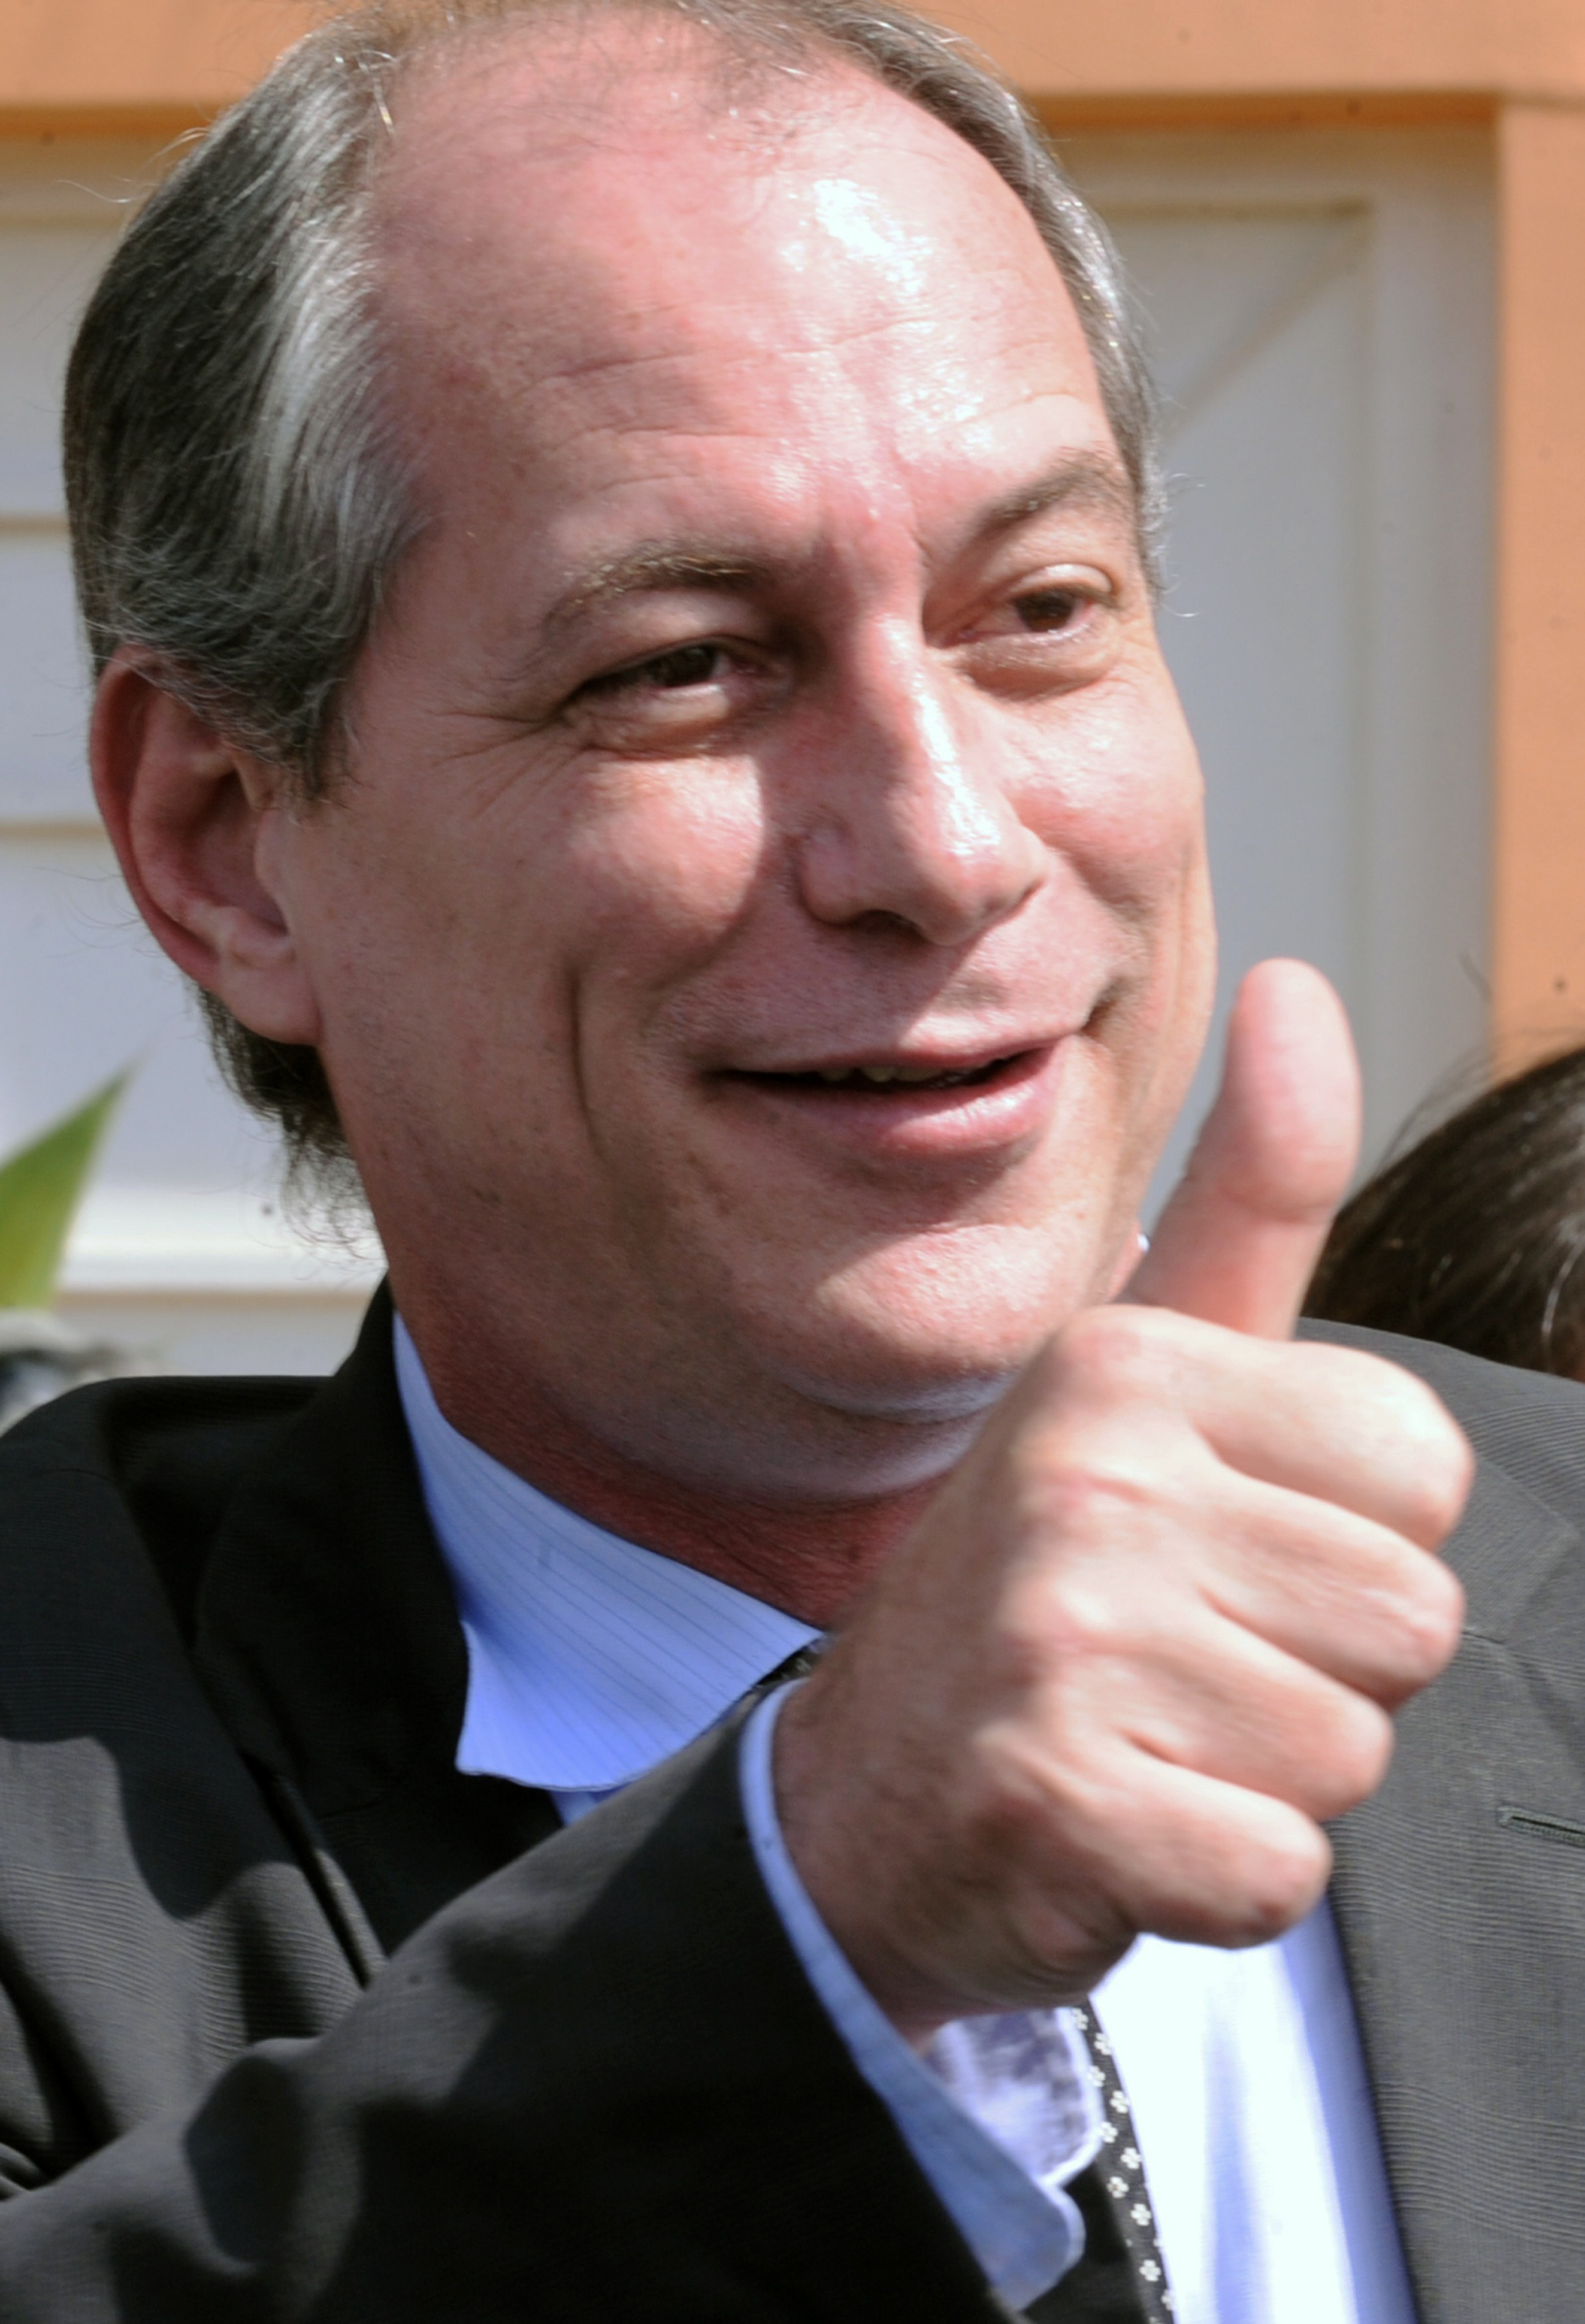 'Na defesa da democracia, vamos tocar fogo na rua', diz Ciro Gomes sobre tuíte de Carlos Bolsonaro